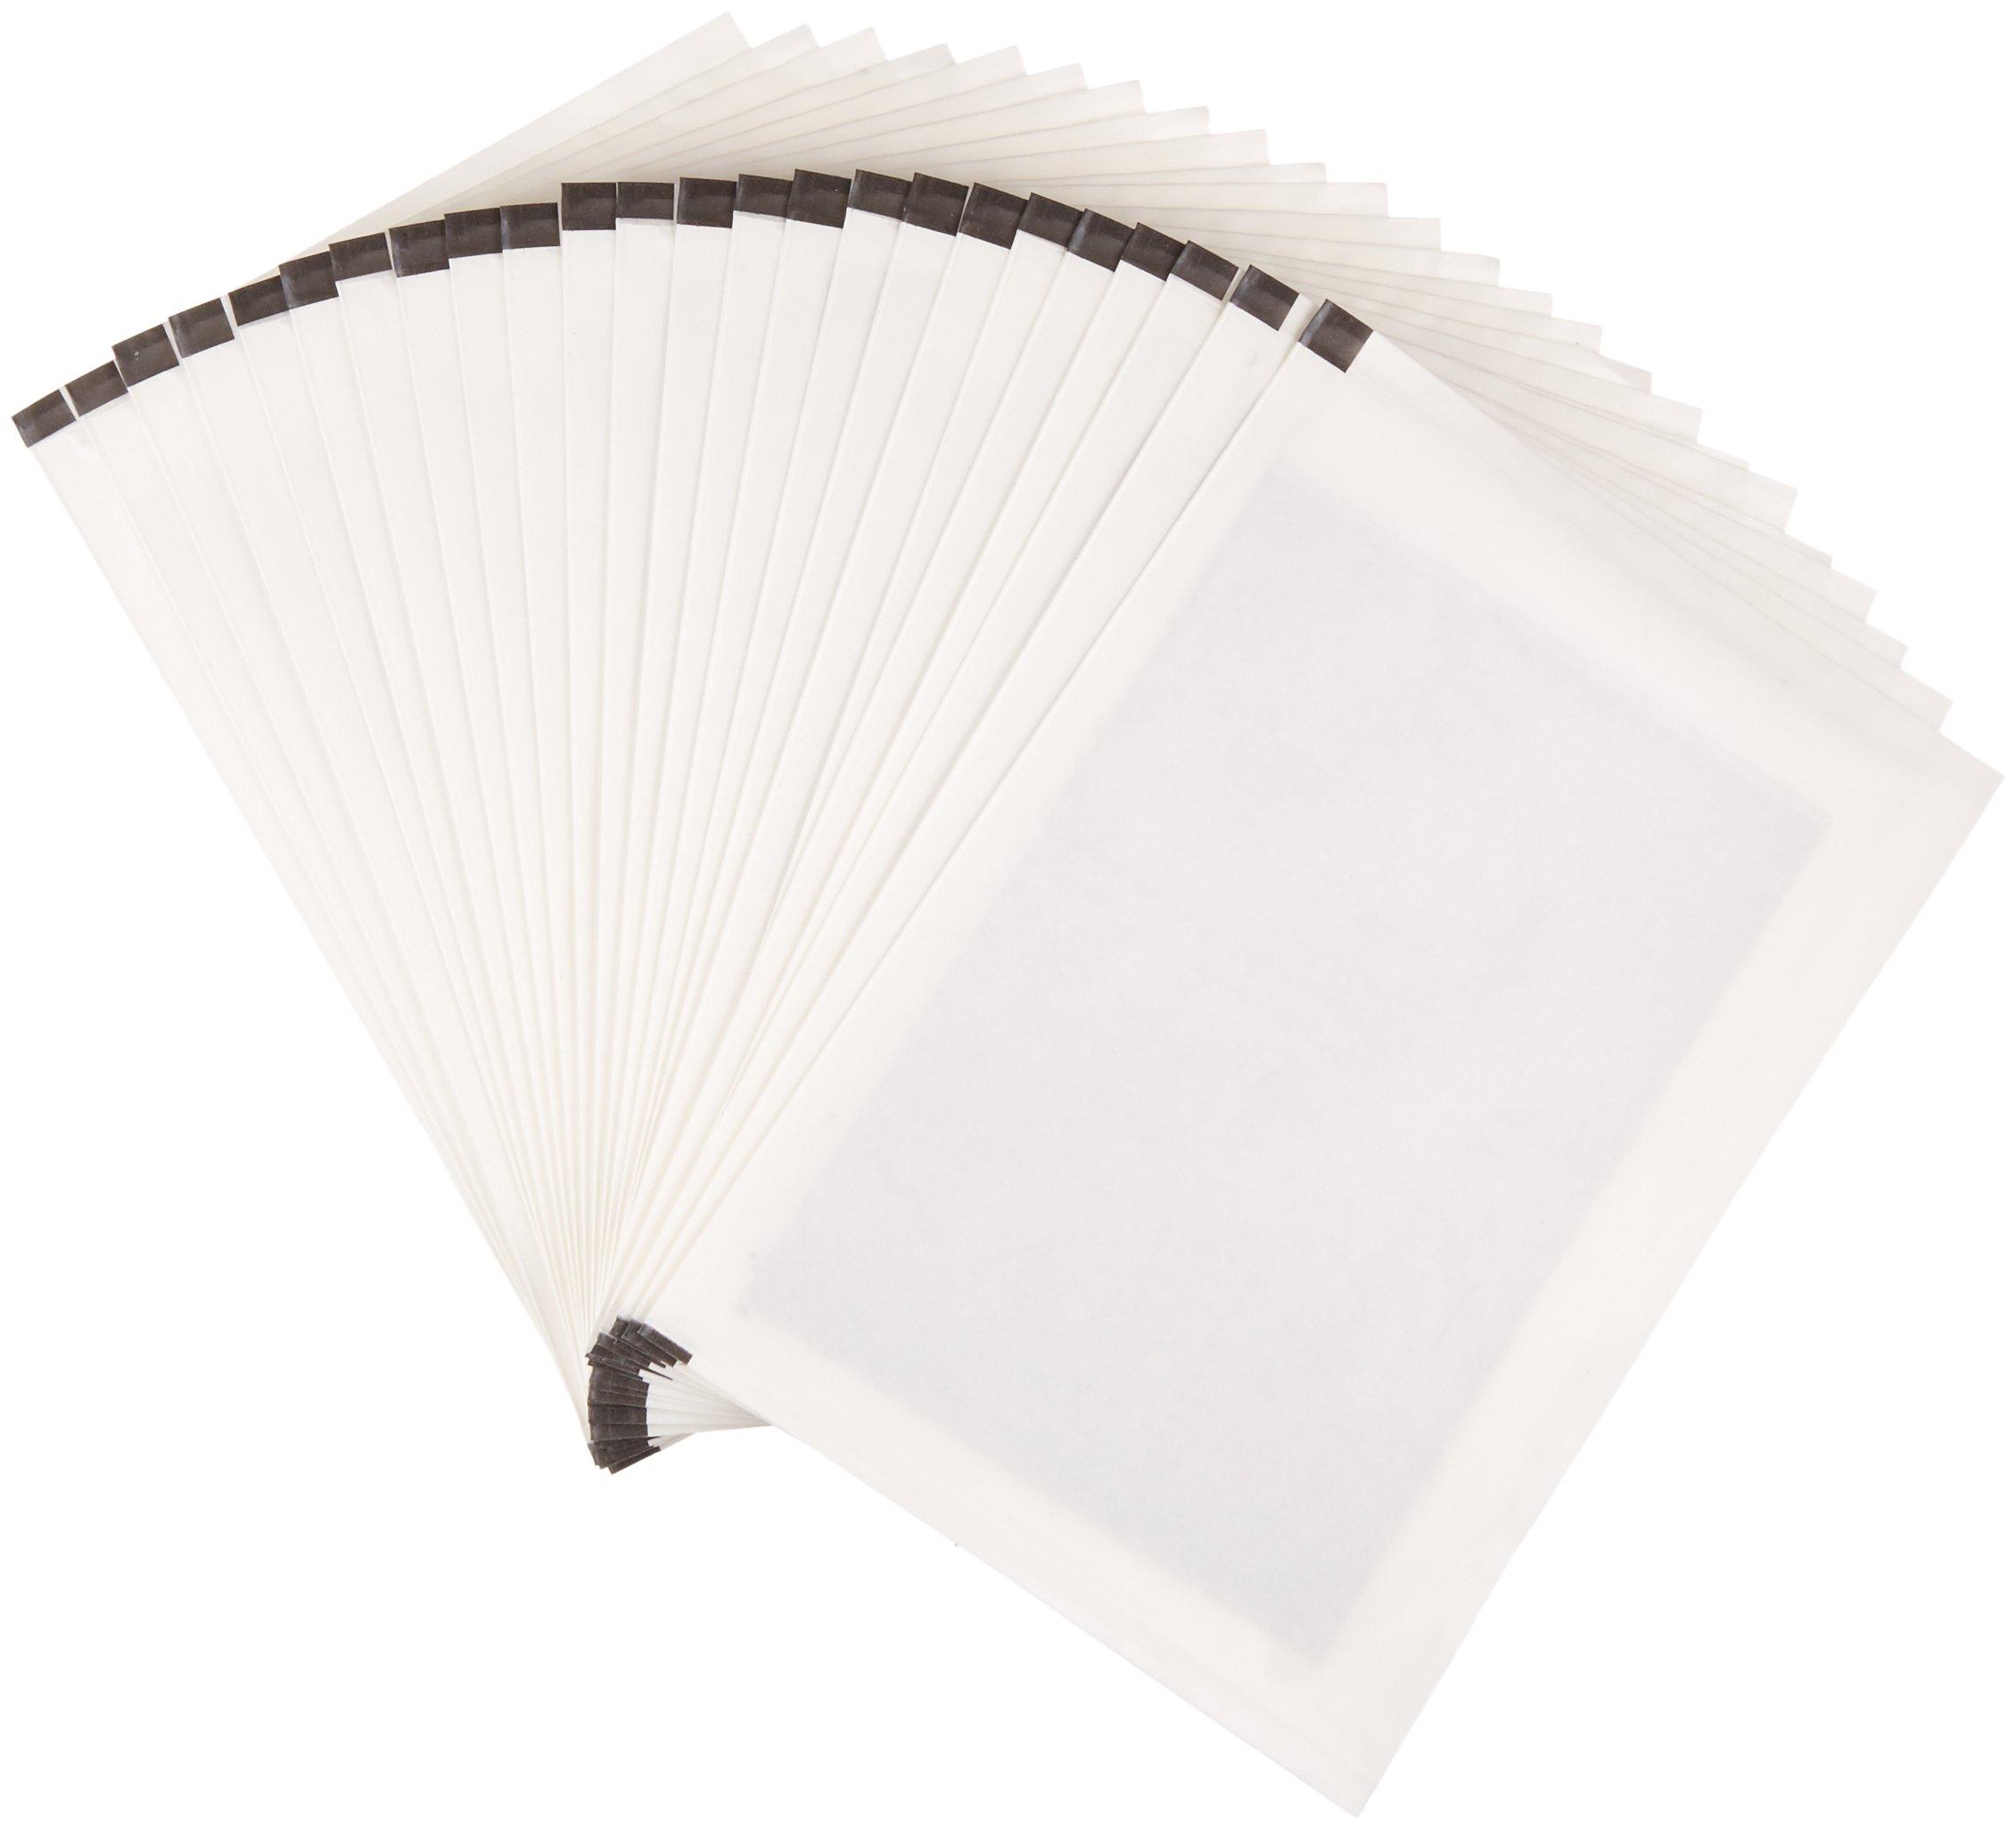 AmazonBasics Paper Shredder Sharpening & Lubricant Sheets - Pack of 24